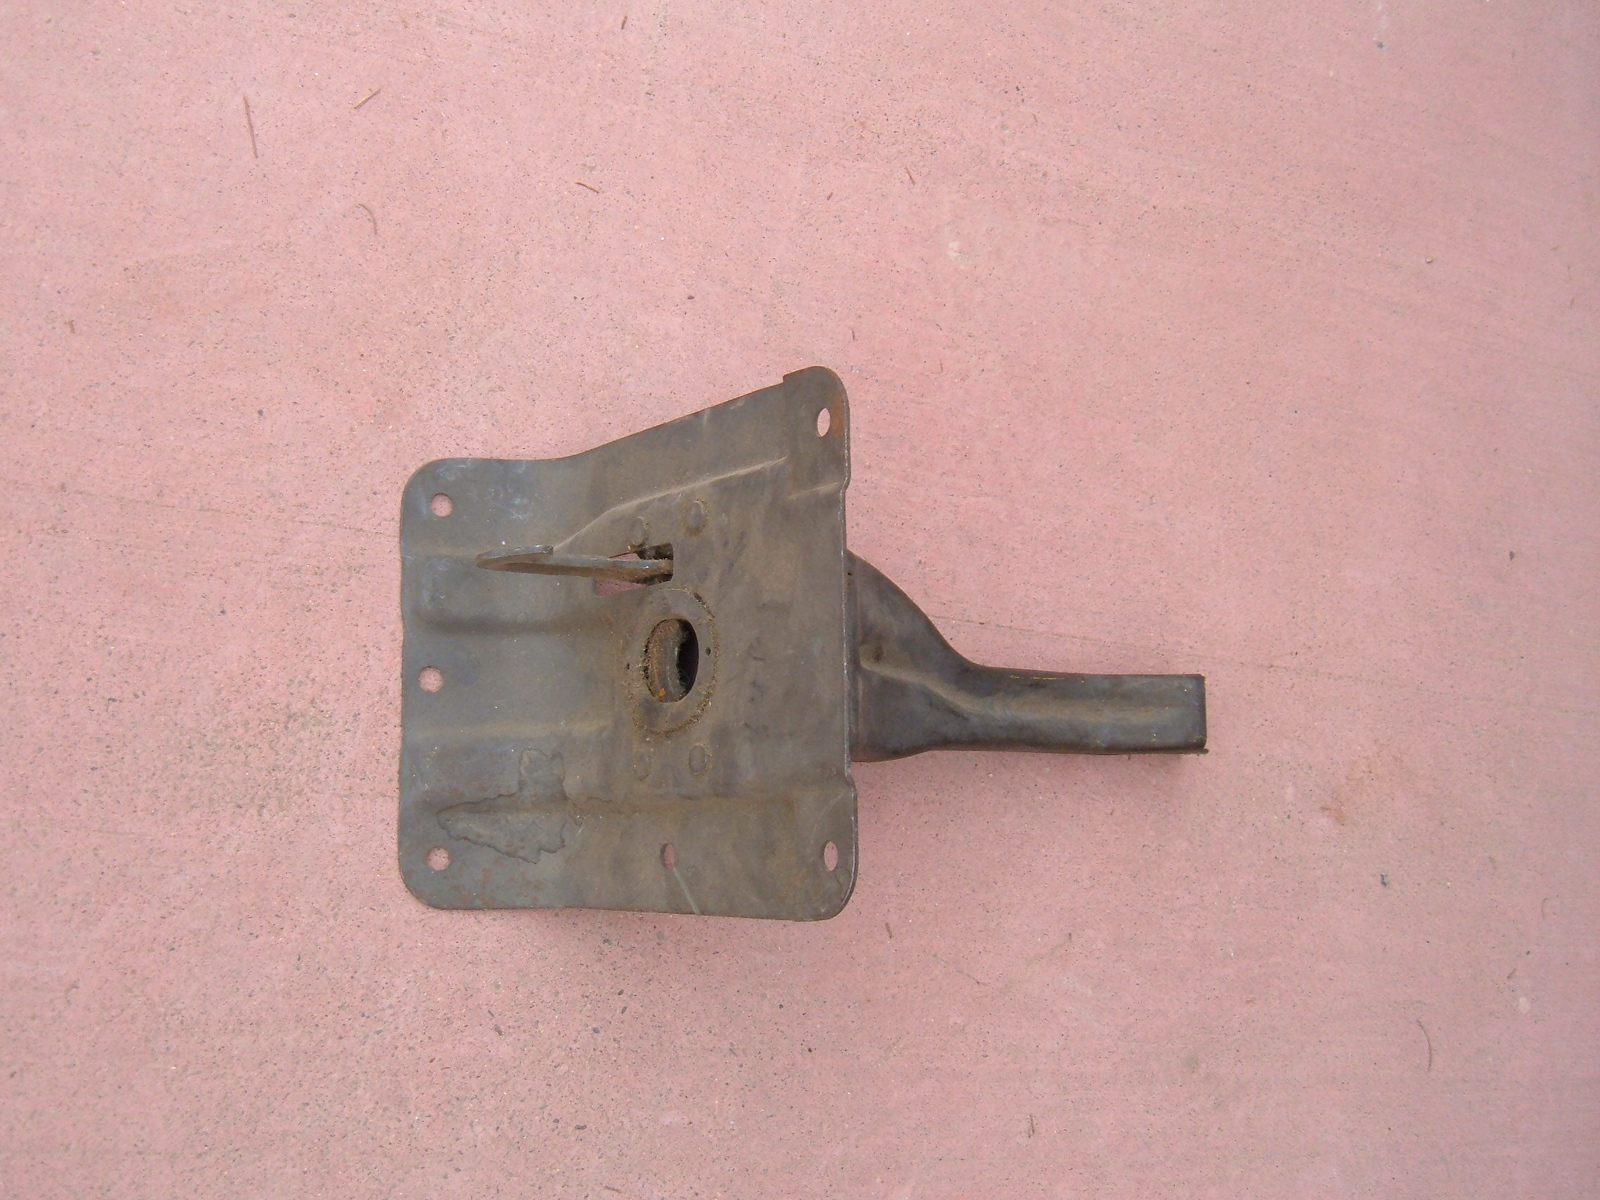 1964 chevrolet impala hood lock latch new gm # 3850861 (z 3850861)